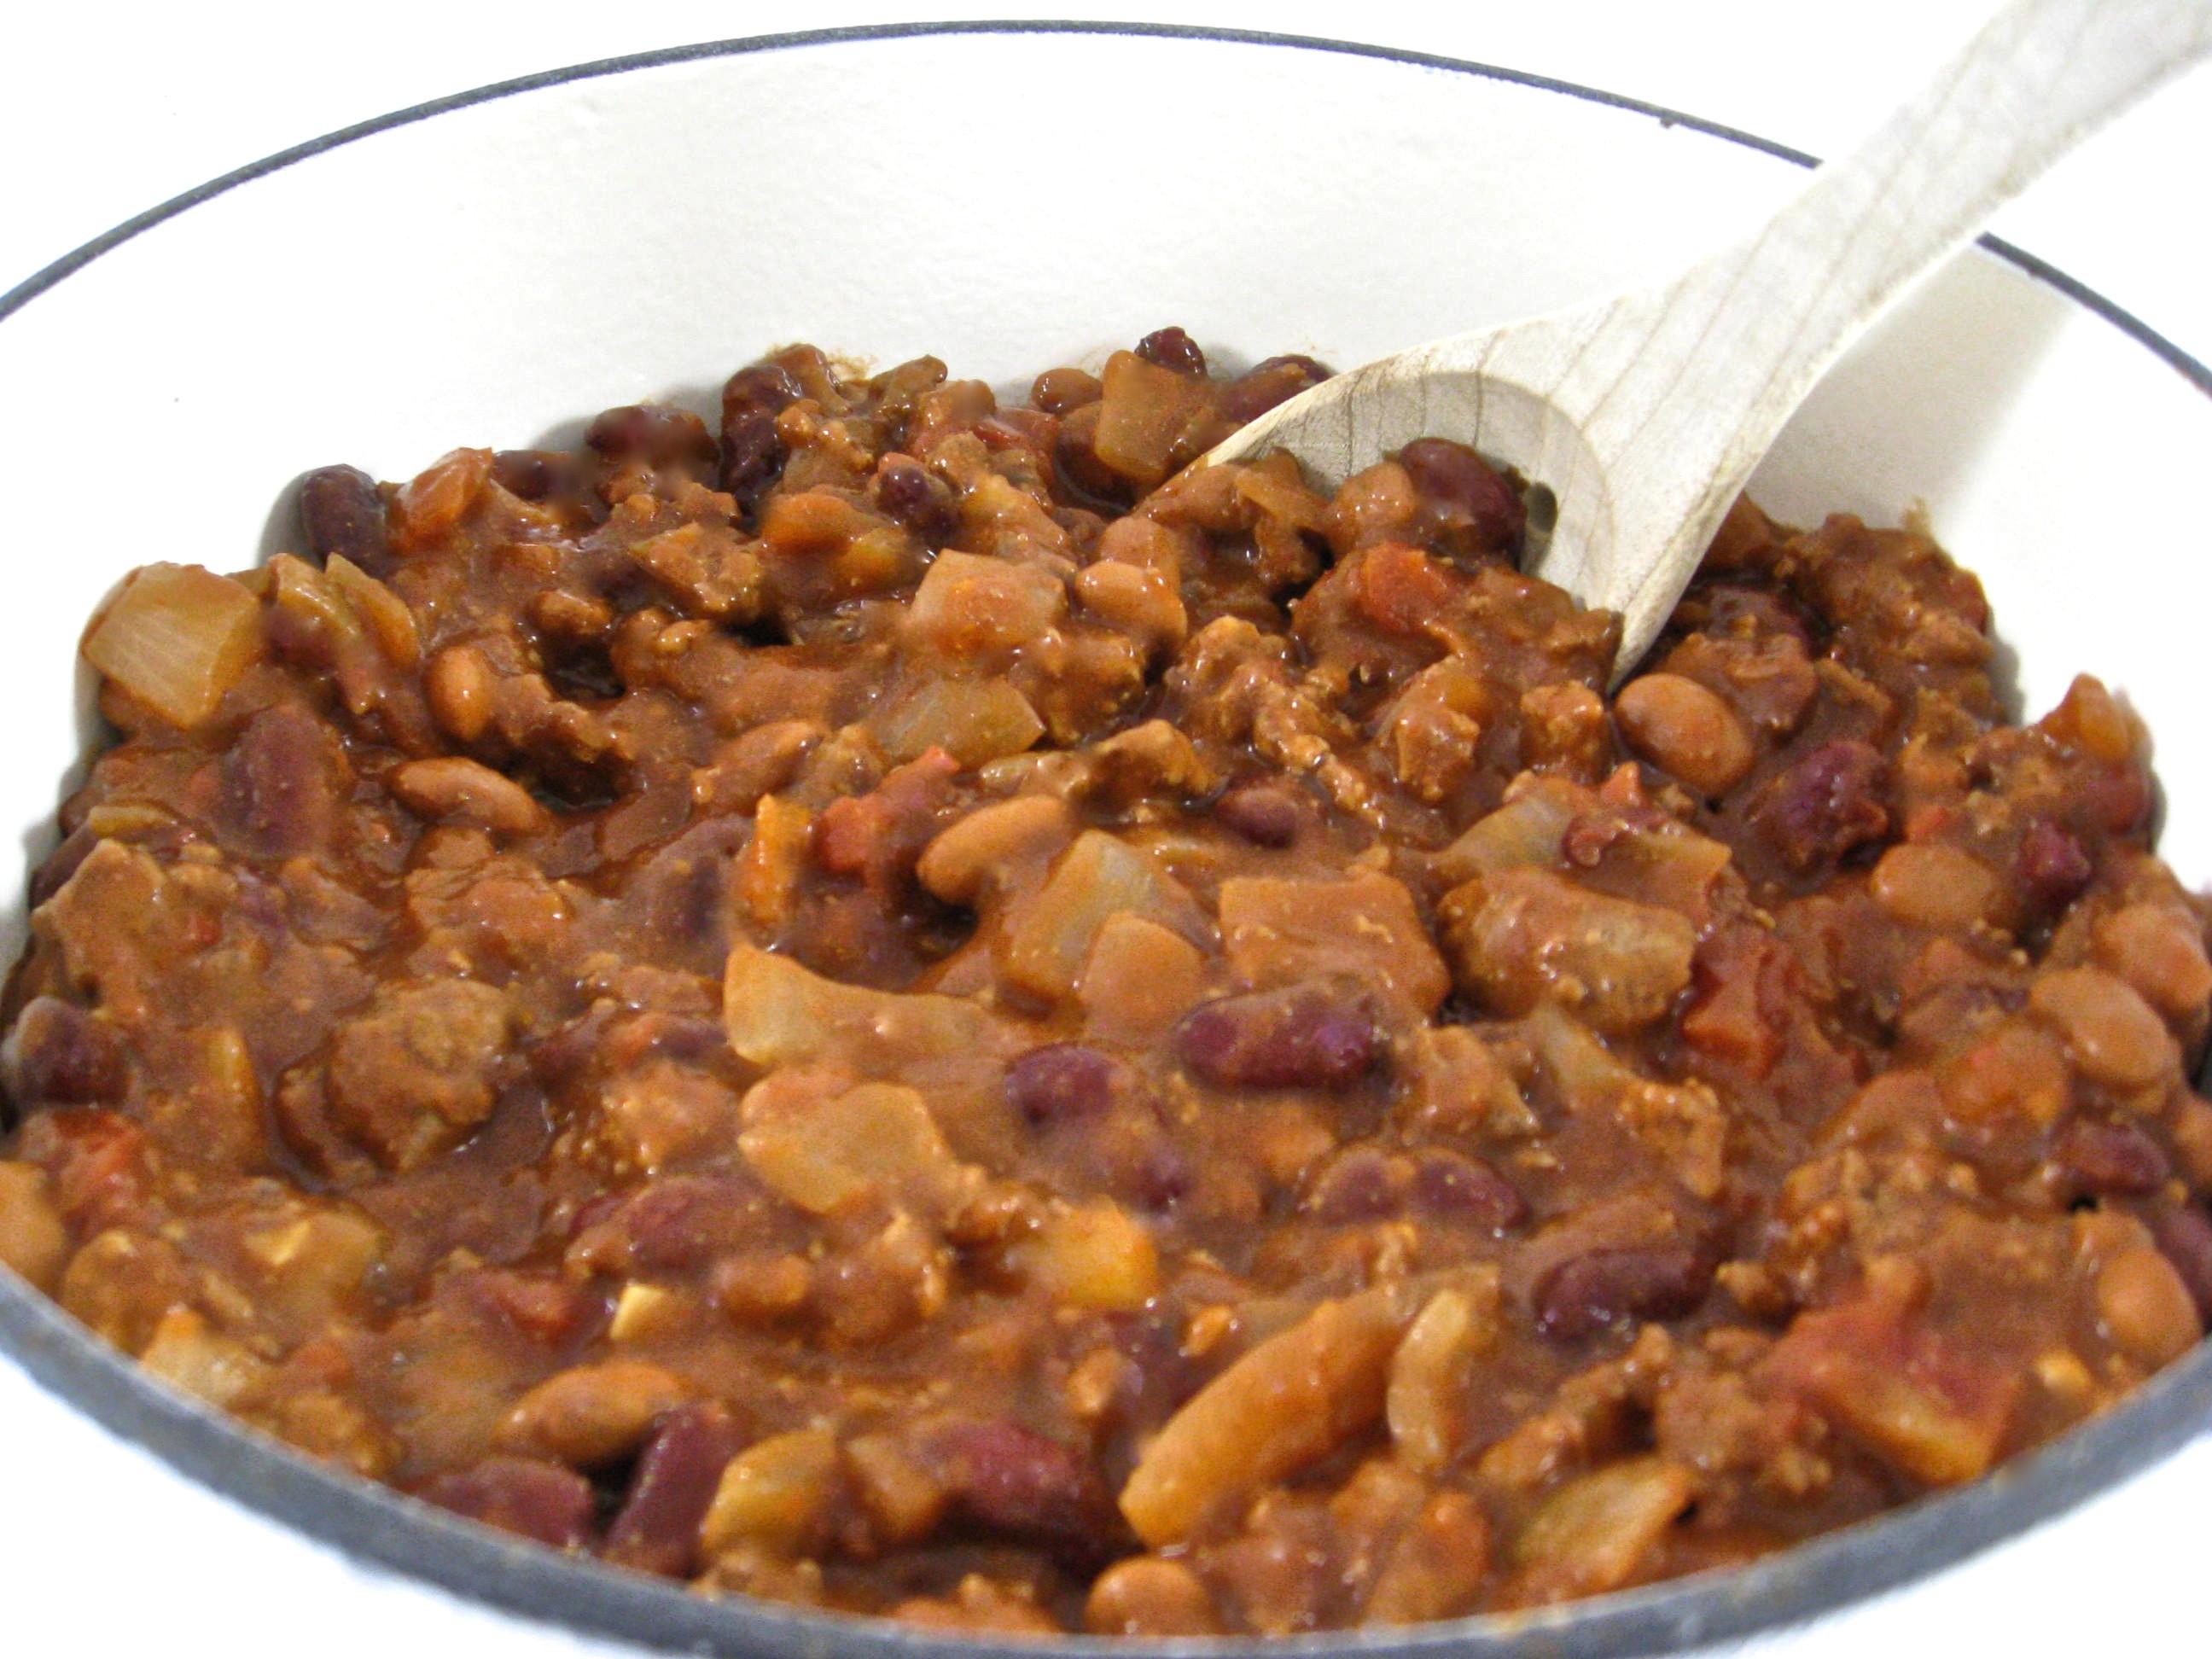 Chili Recipe Turkey  weight watcher chili recipe with turkey